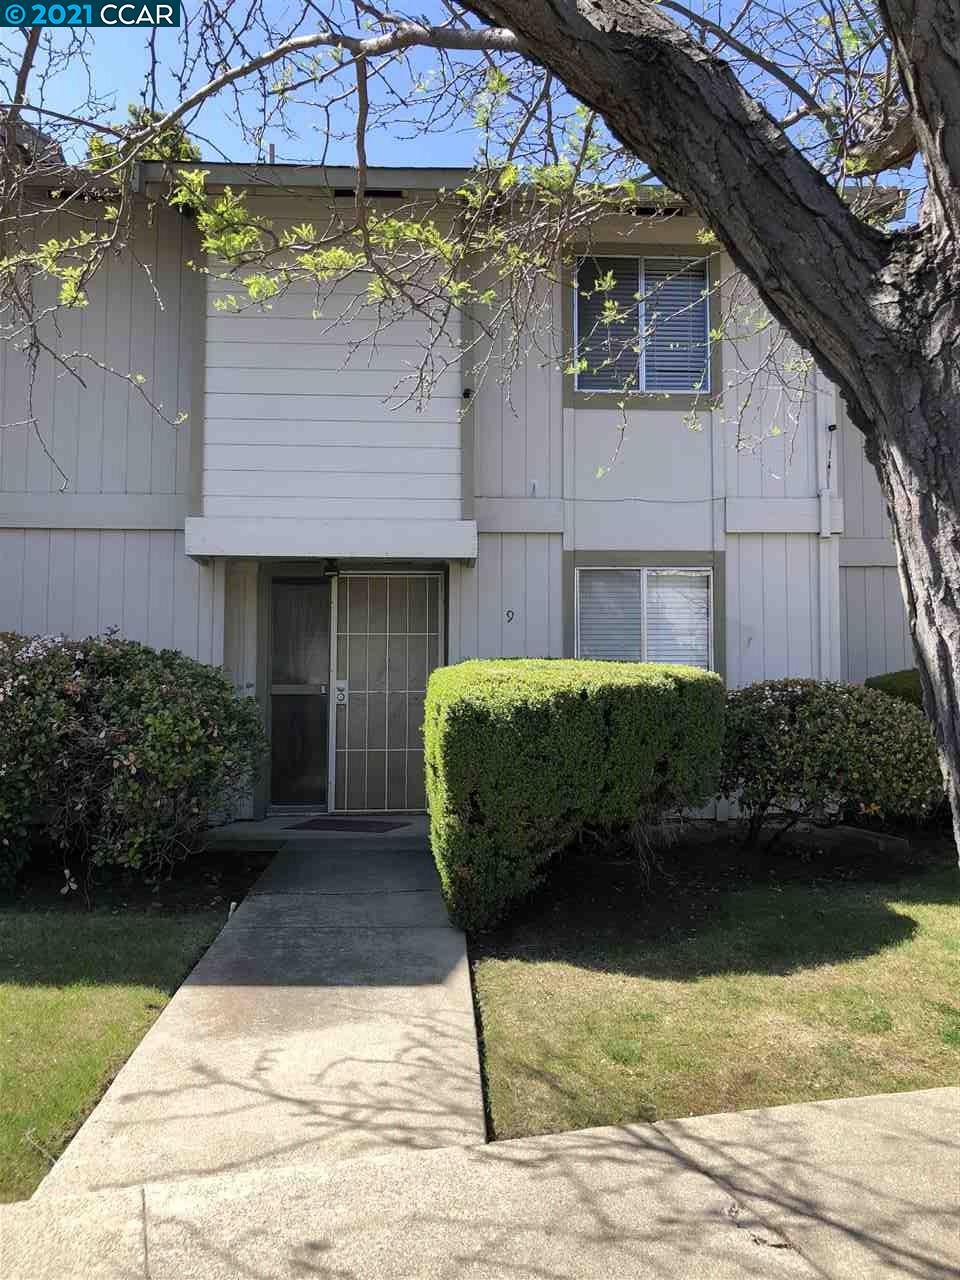 1725 Landana, Concord, California 94519, 3 Bedrooms Bedrooms, ,3 BathroomsBathrooms,Townhouse,For Sale,1725 Landana,2,40943653